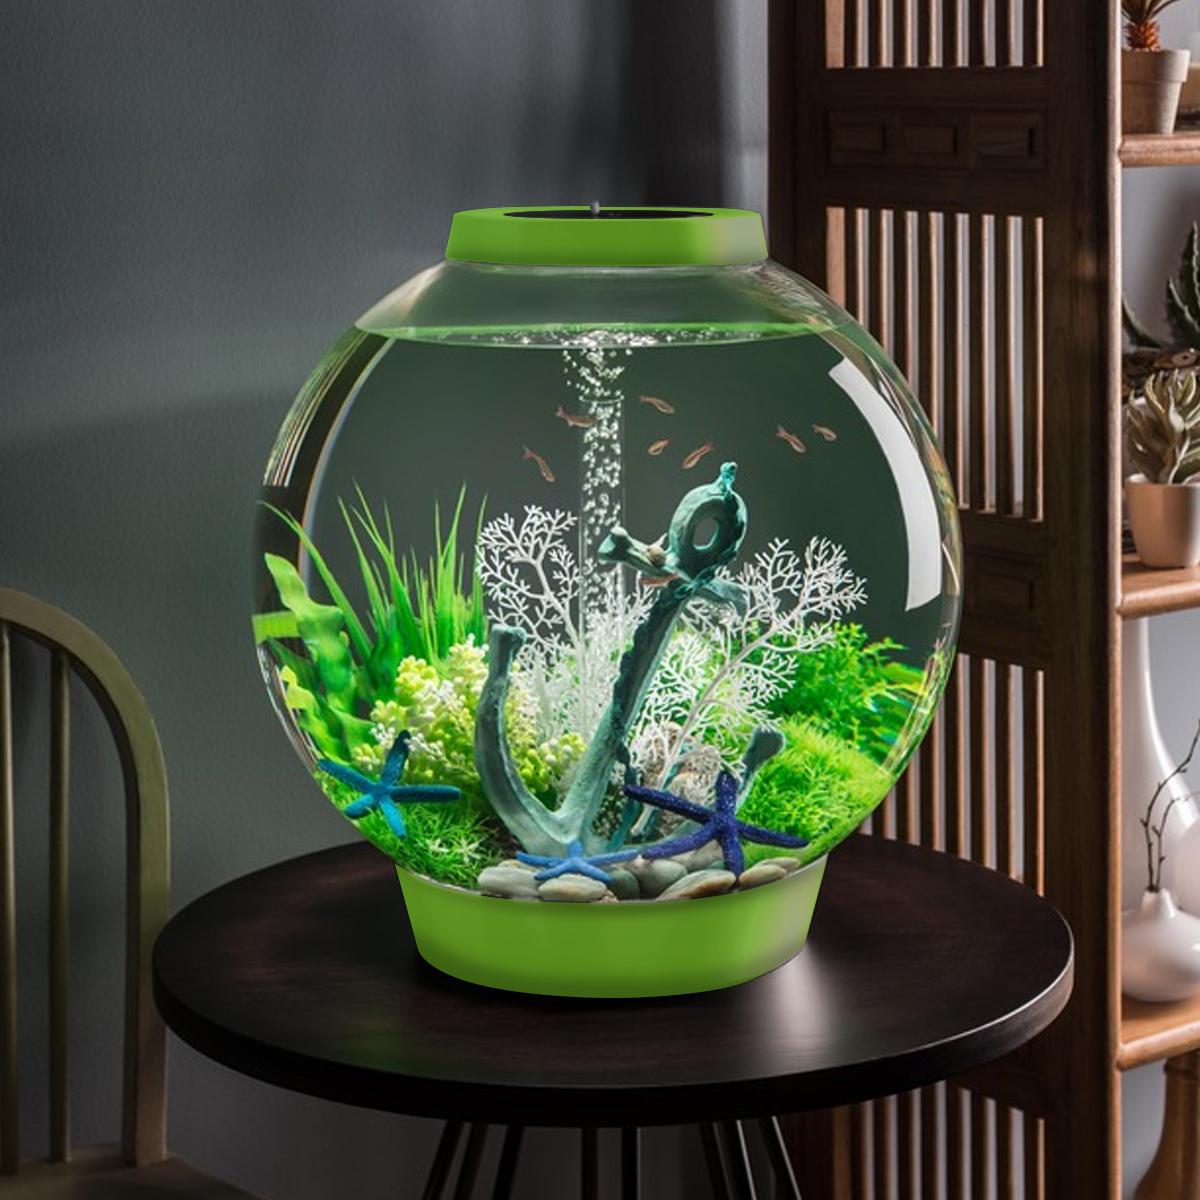 Biorb classic 60l leaf green aquarium led lighting acrylic for Fish tank bowl